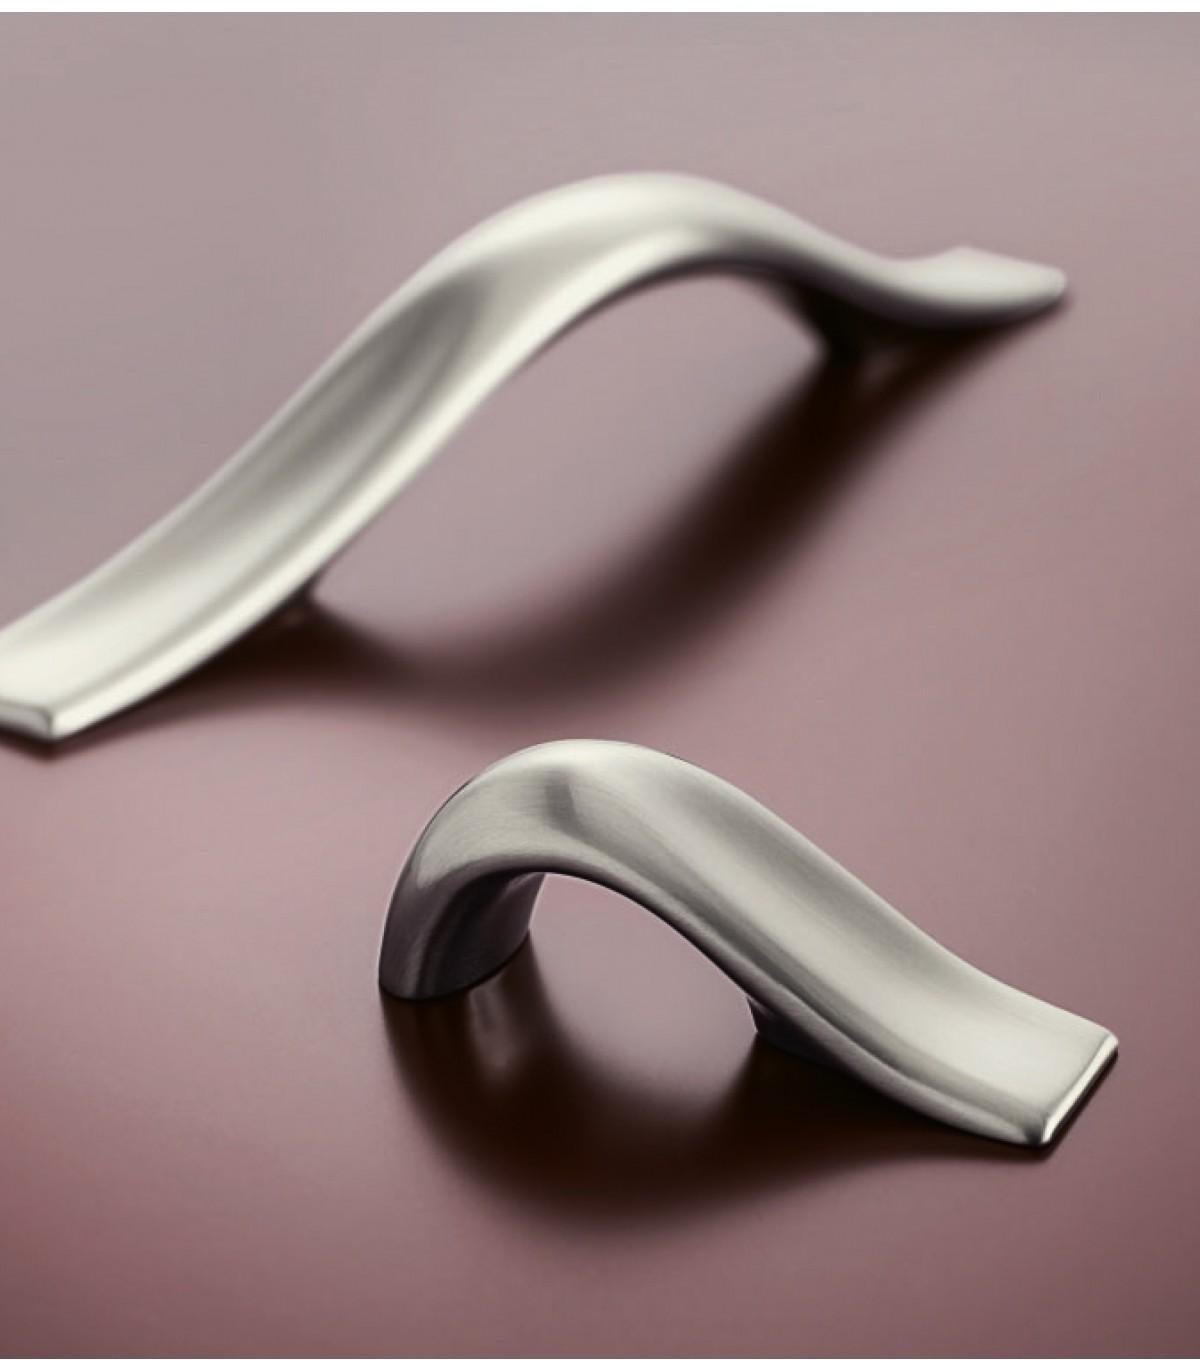 Poignee Bouton De Meuble Design Vela Par Bosetti Marella